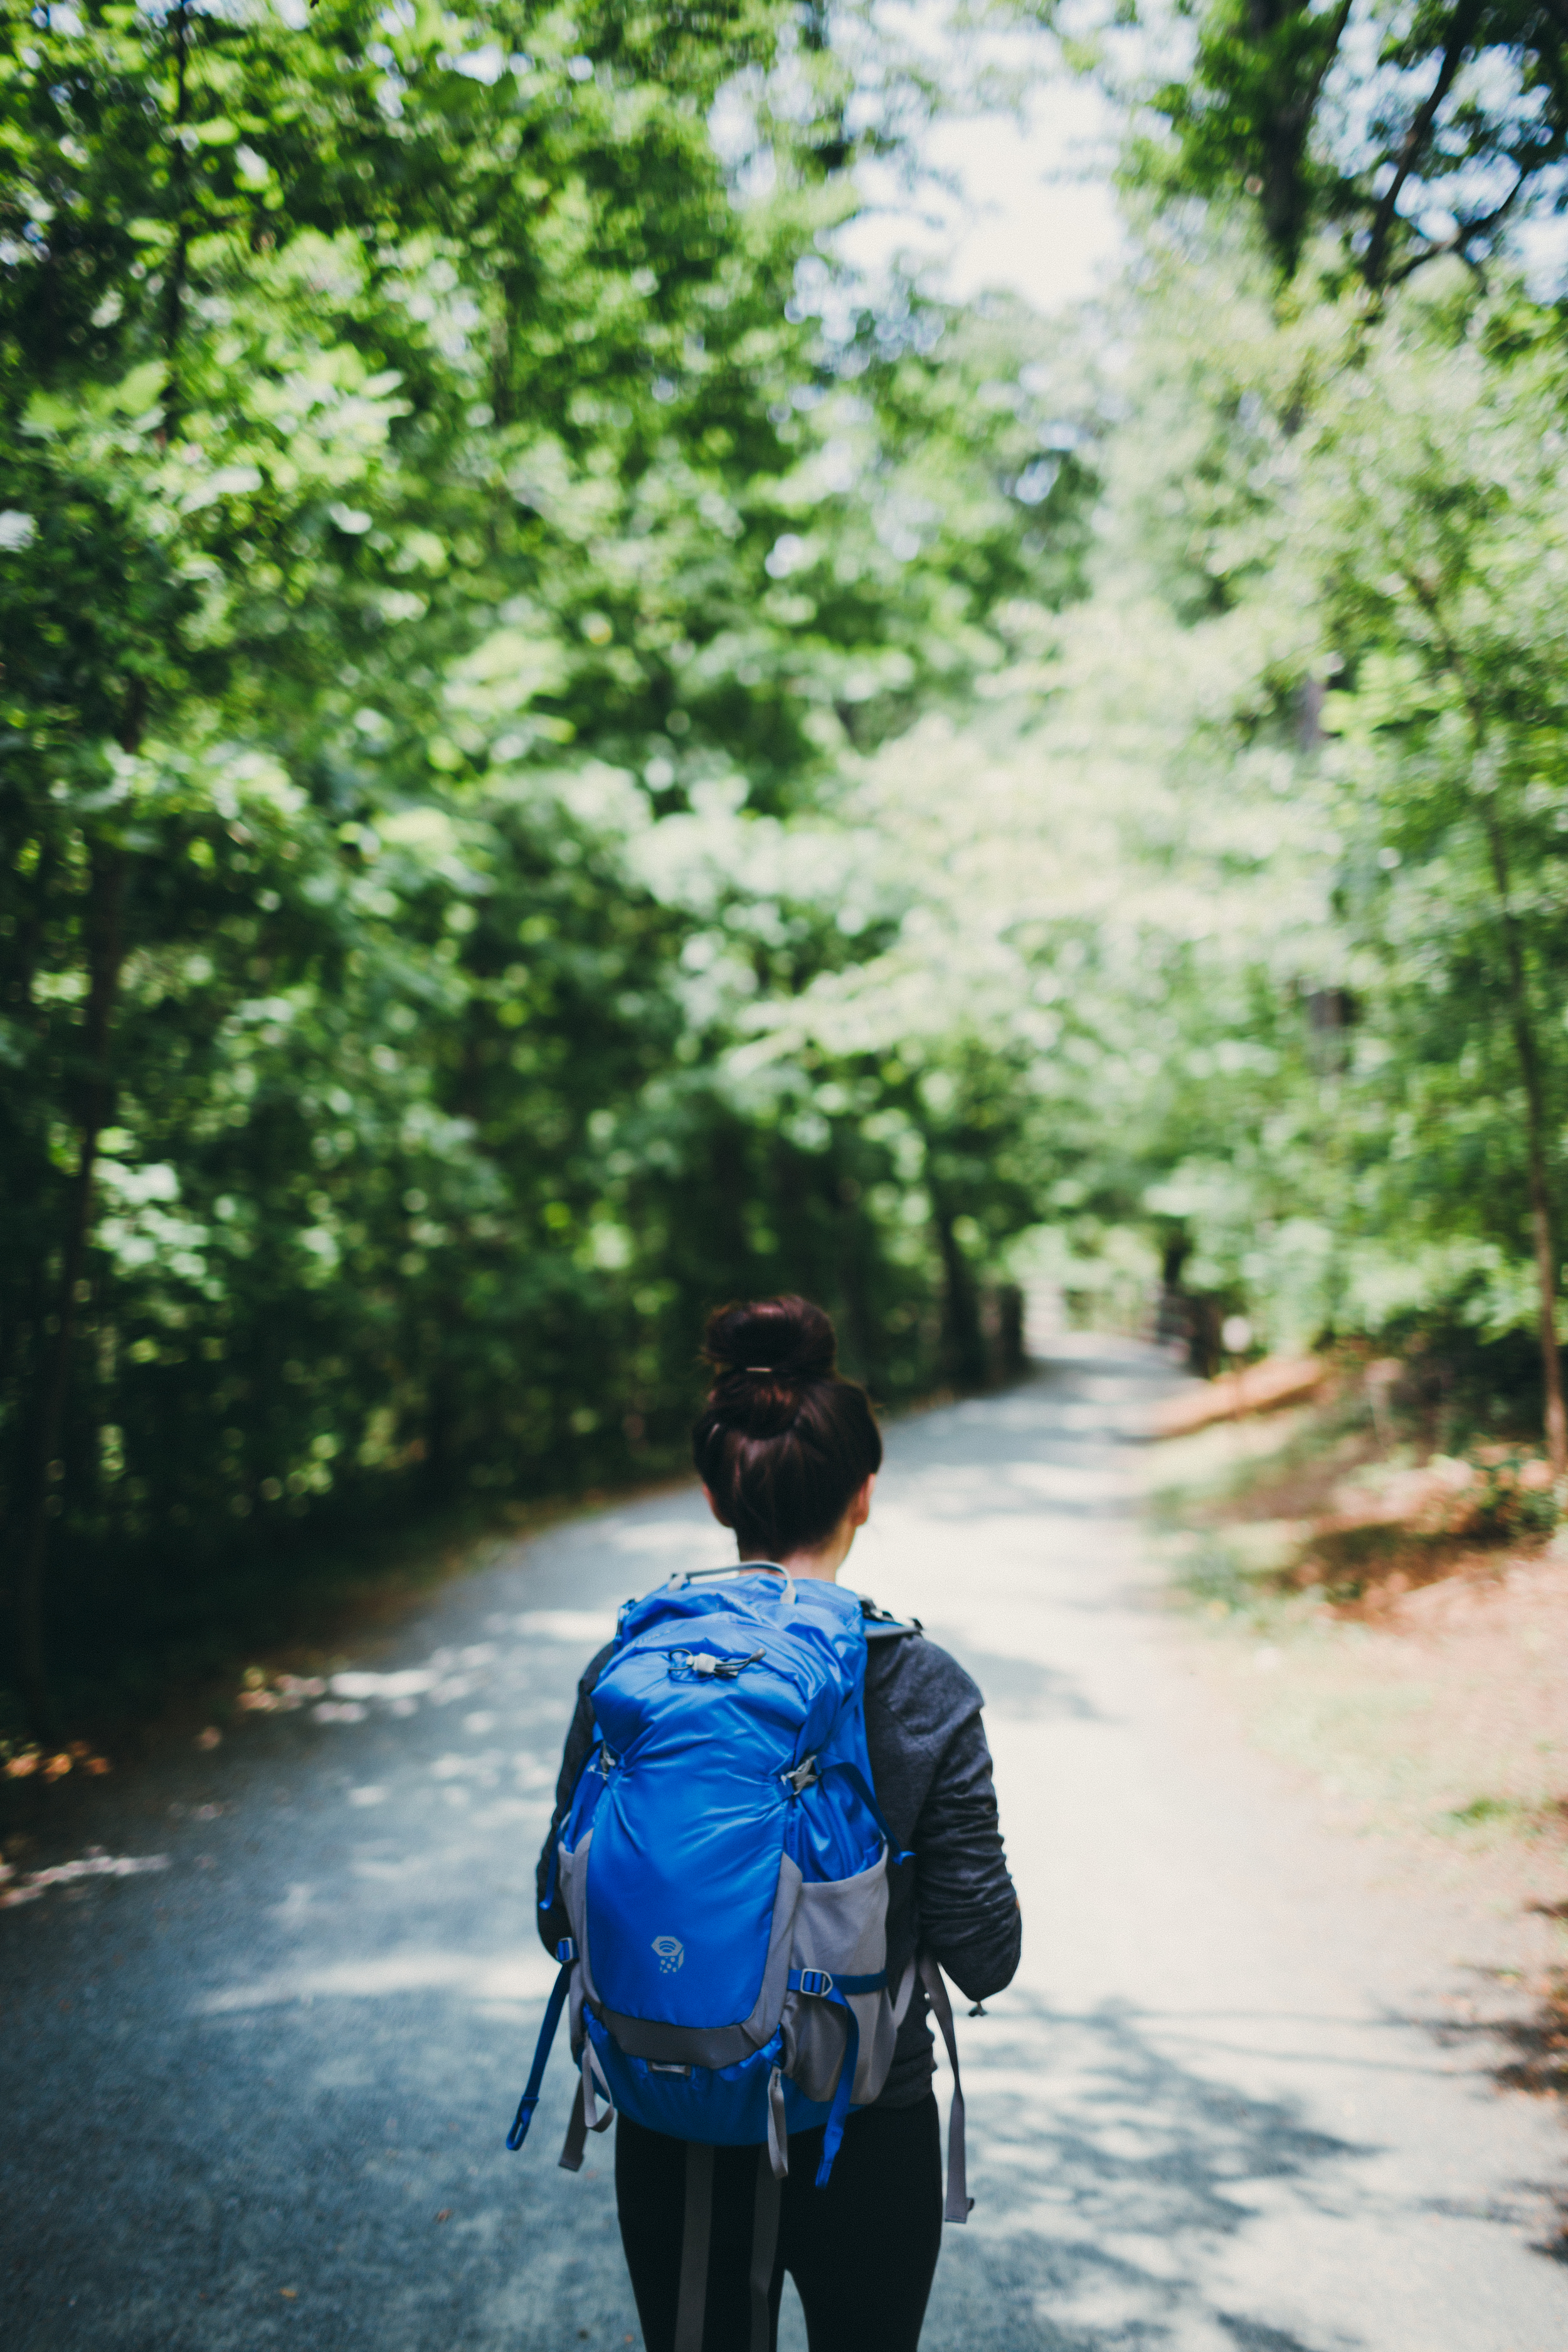 cheyenne kody NR MHW backpack-12.jpg